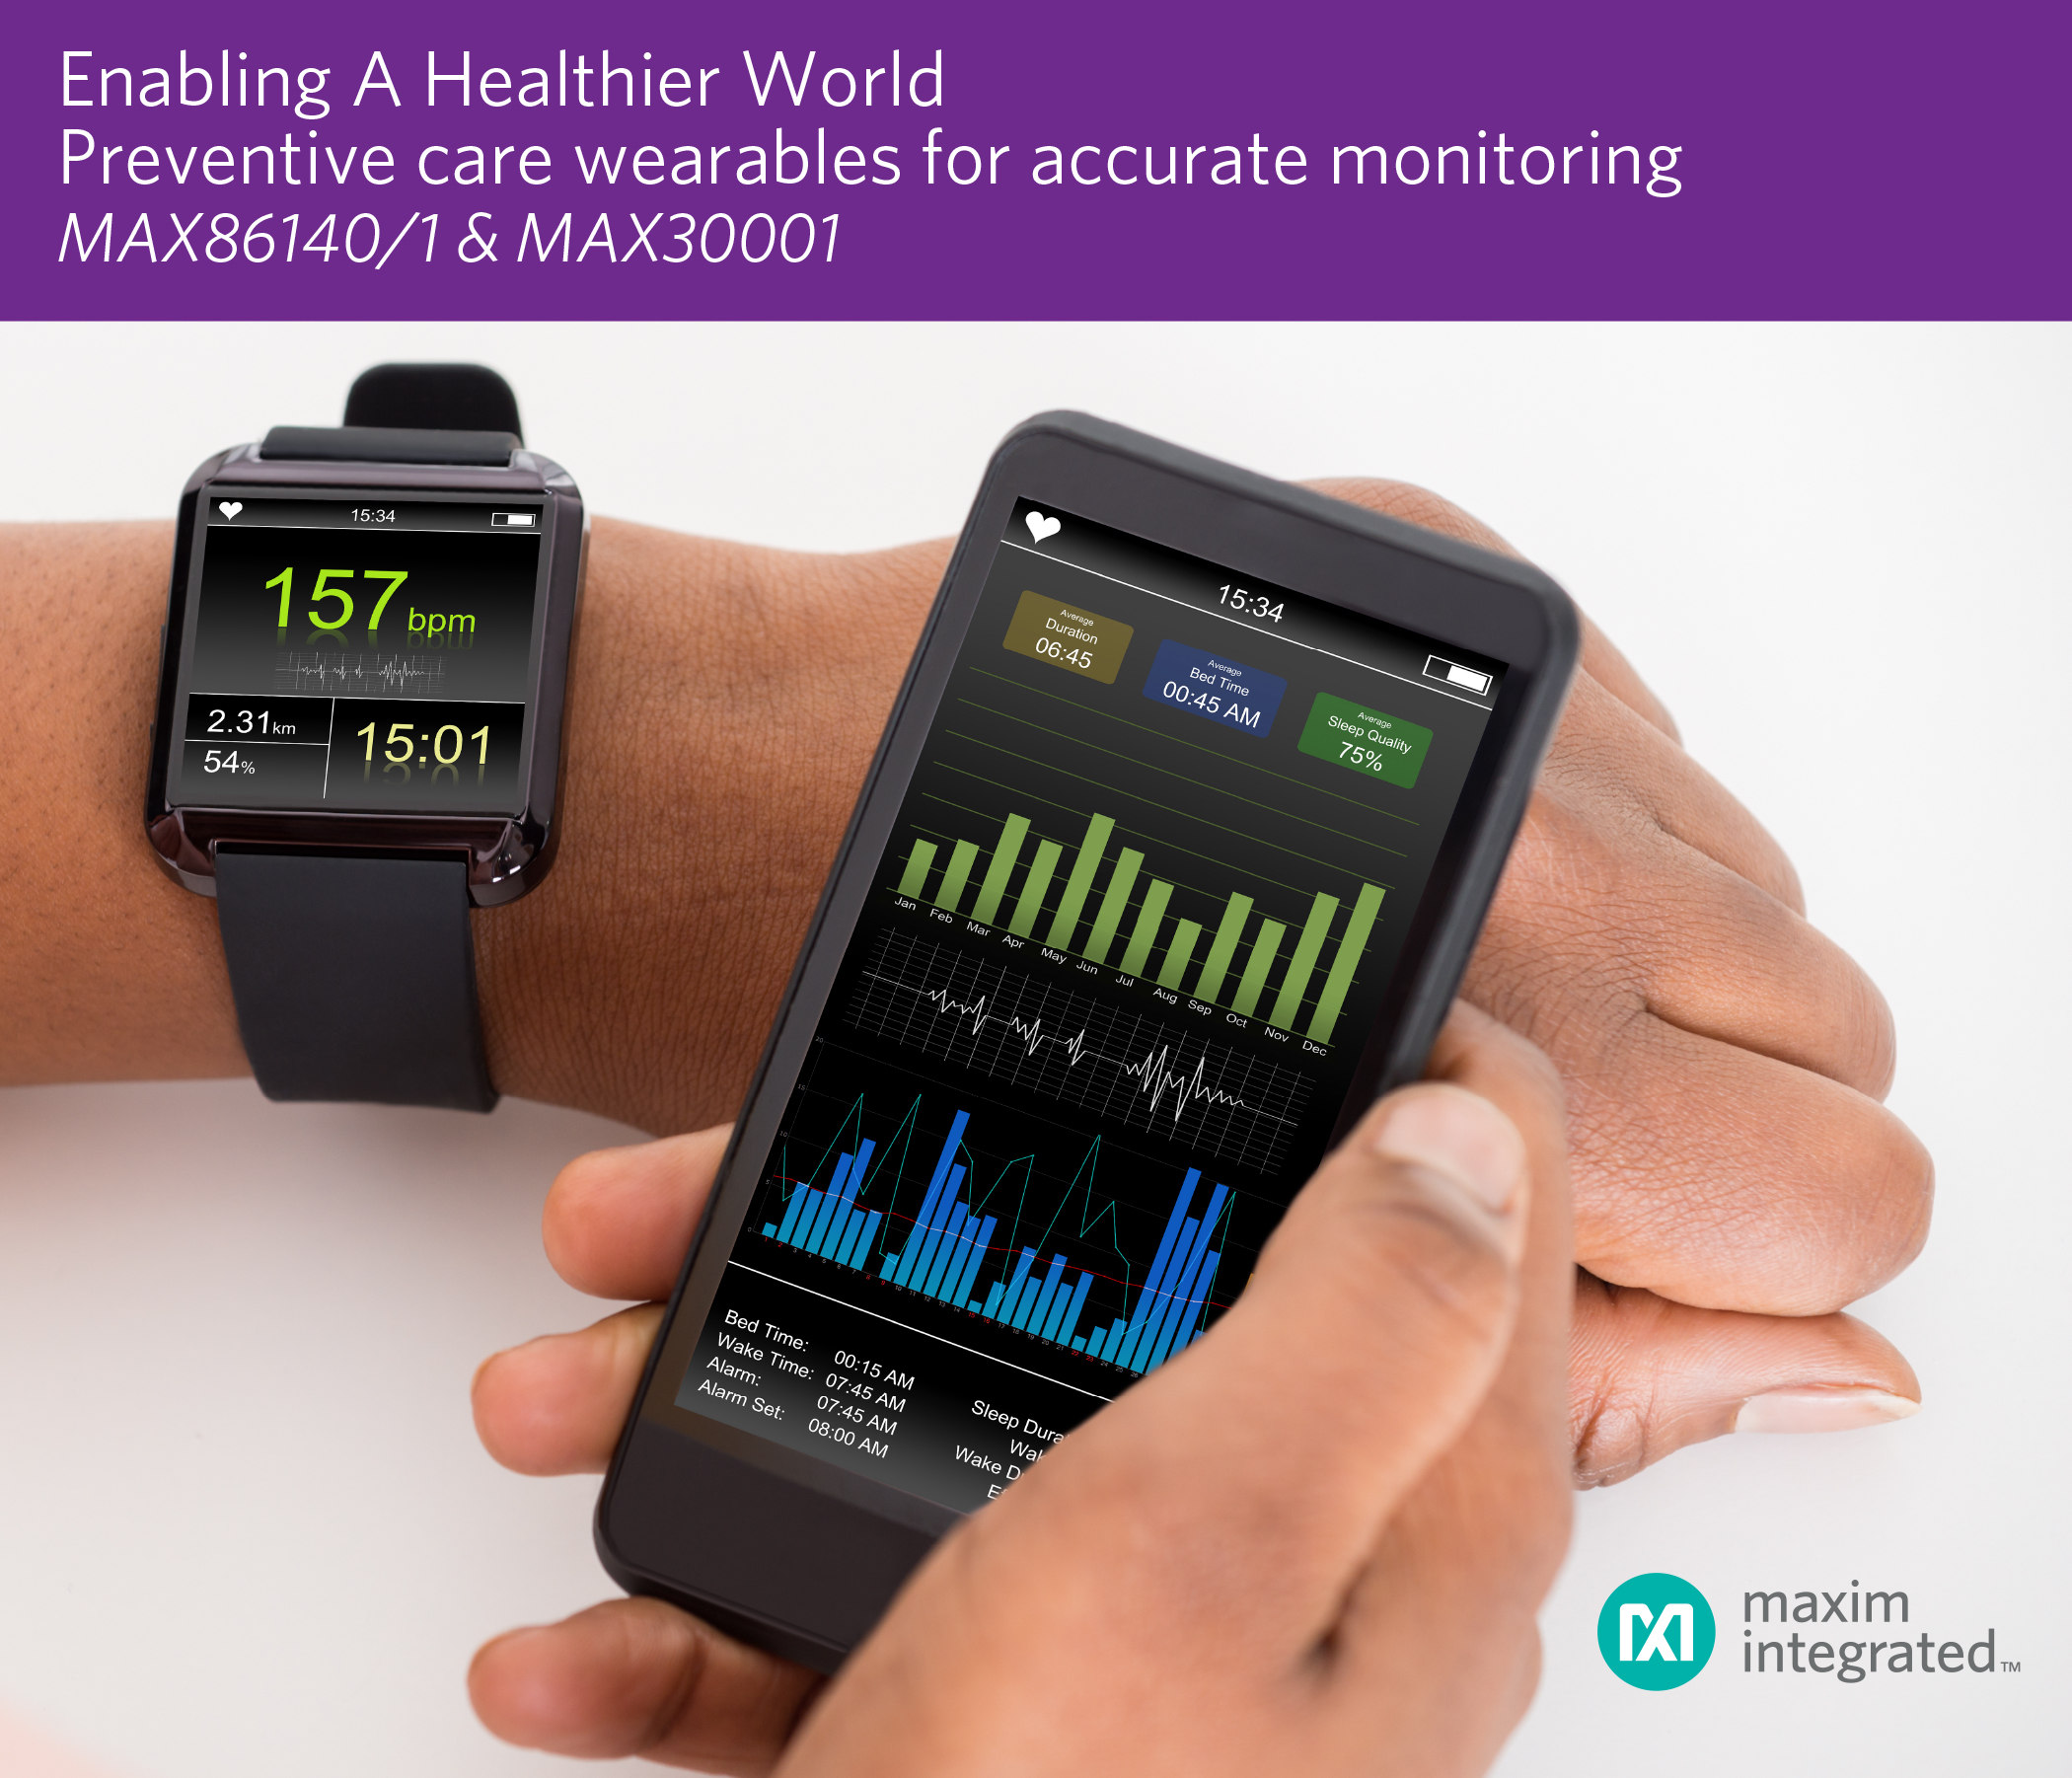 Maxim积极把握可穿戴设备发展良机,有力支持预防性健康和健身应用